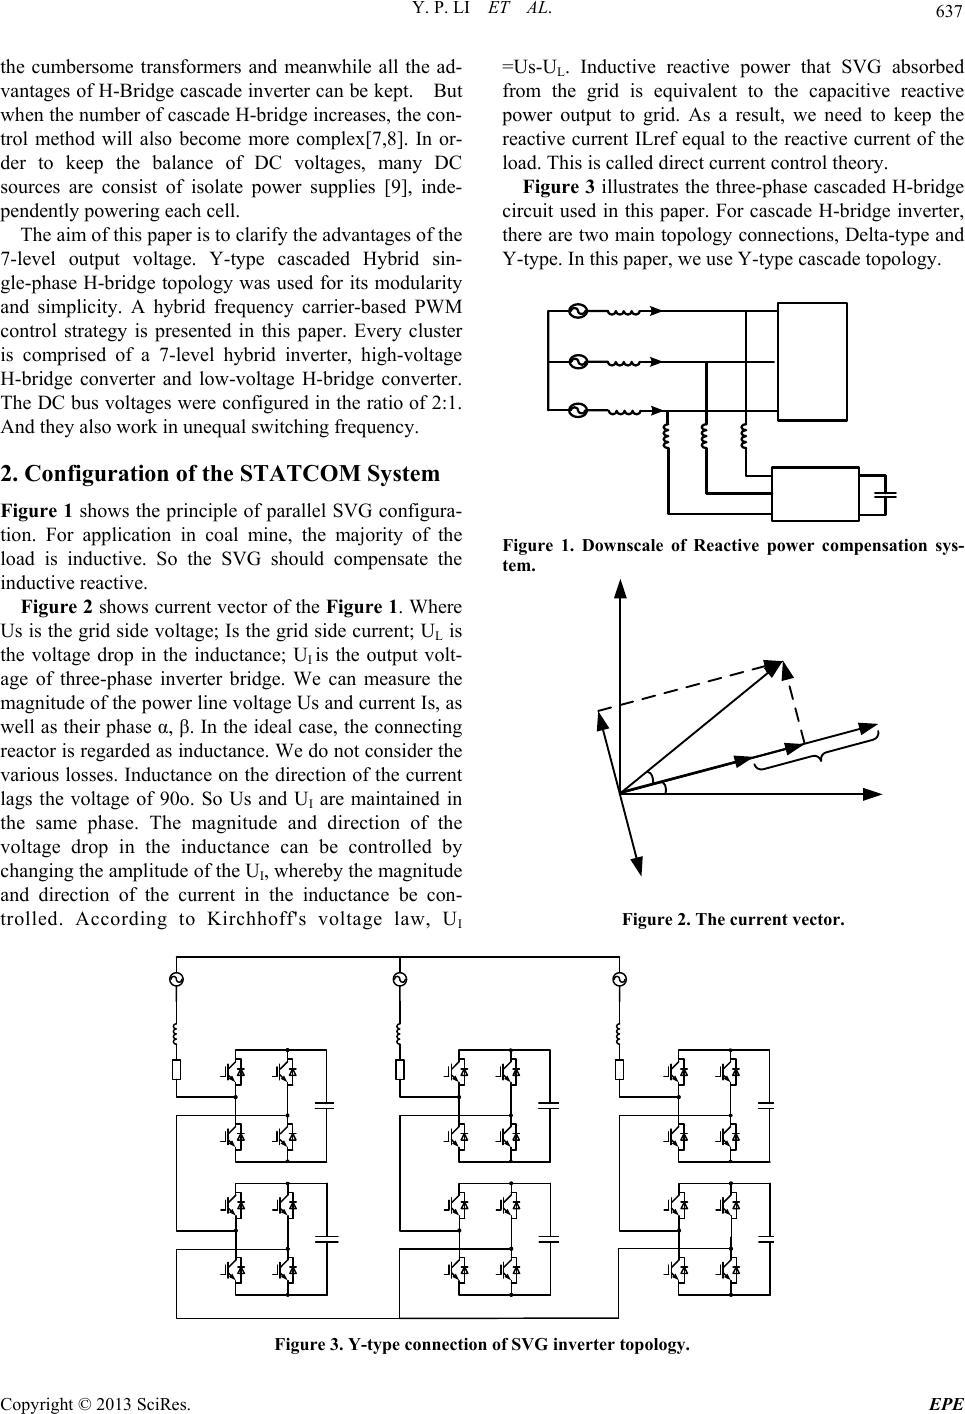 thesis report on statcom